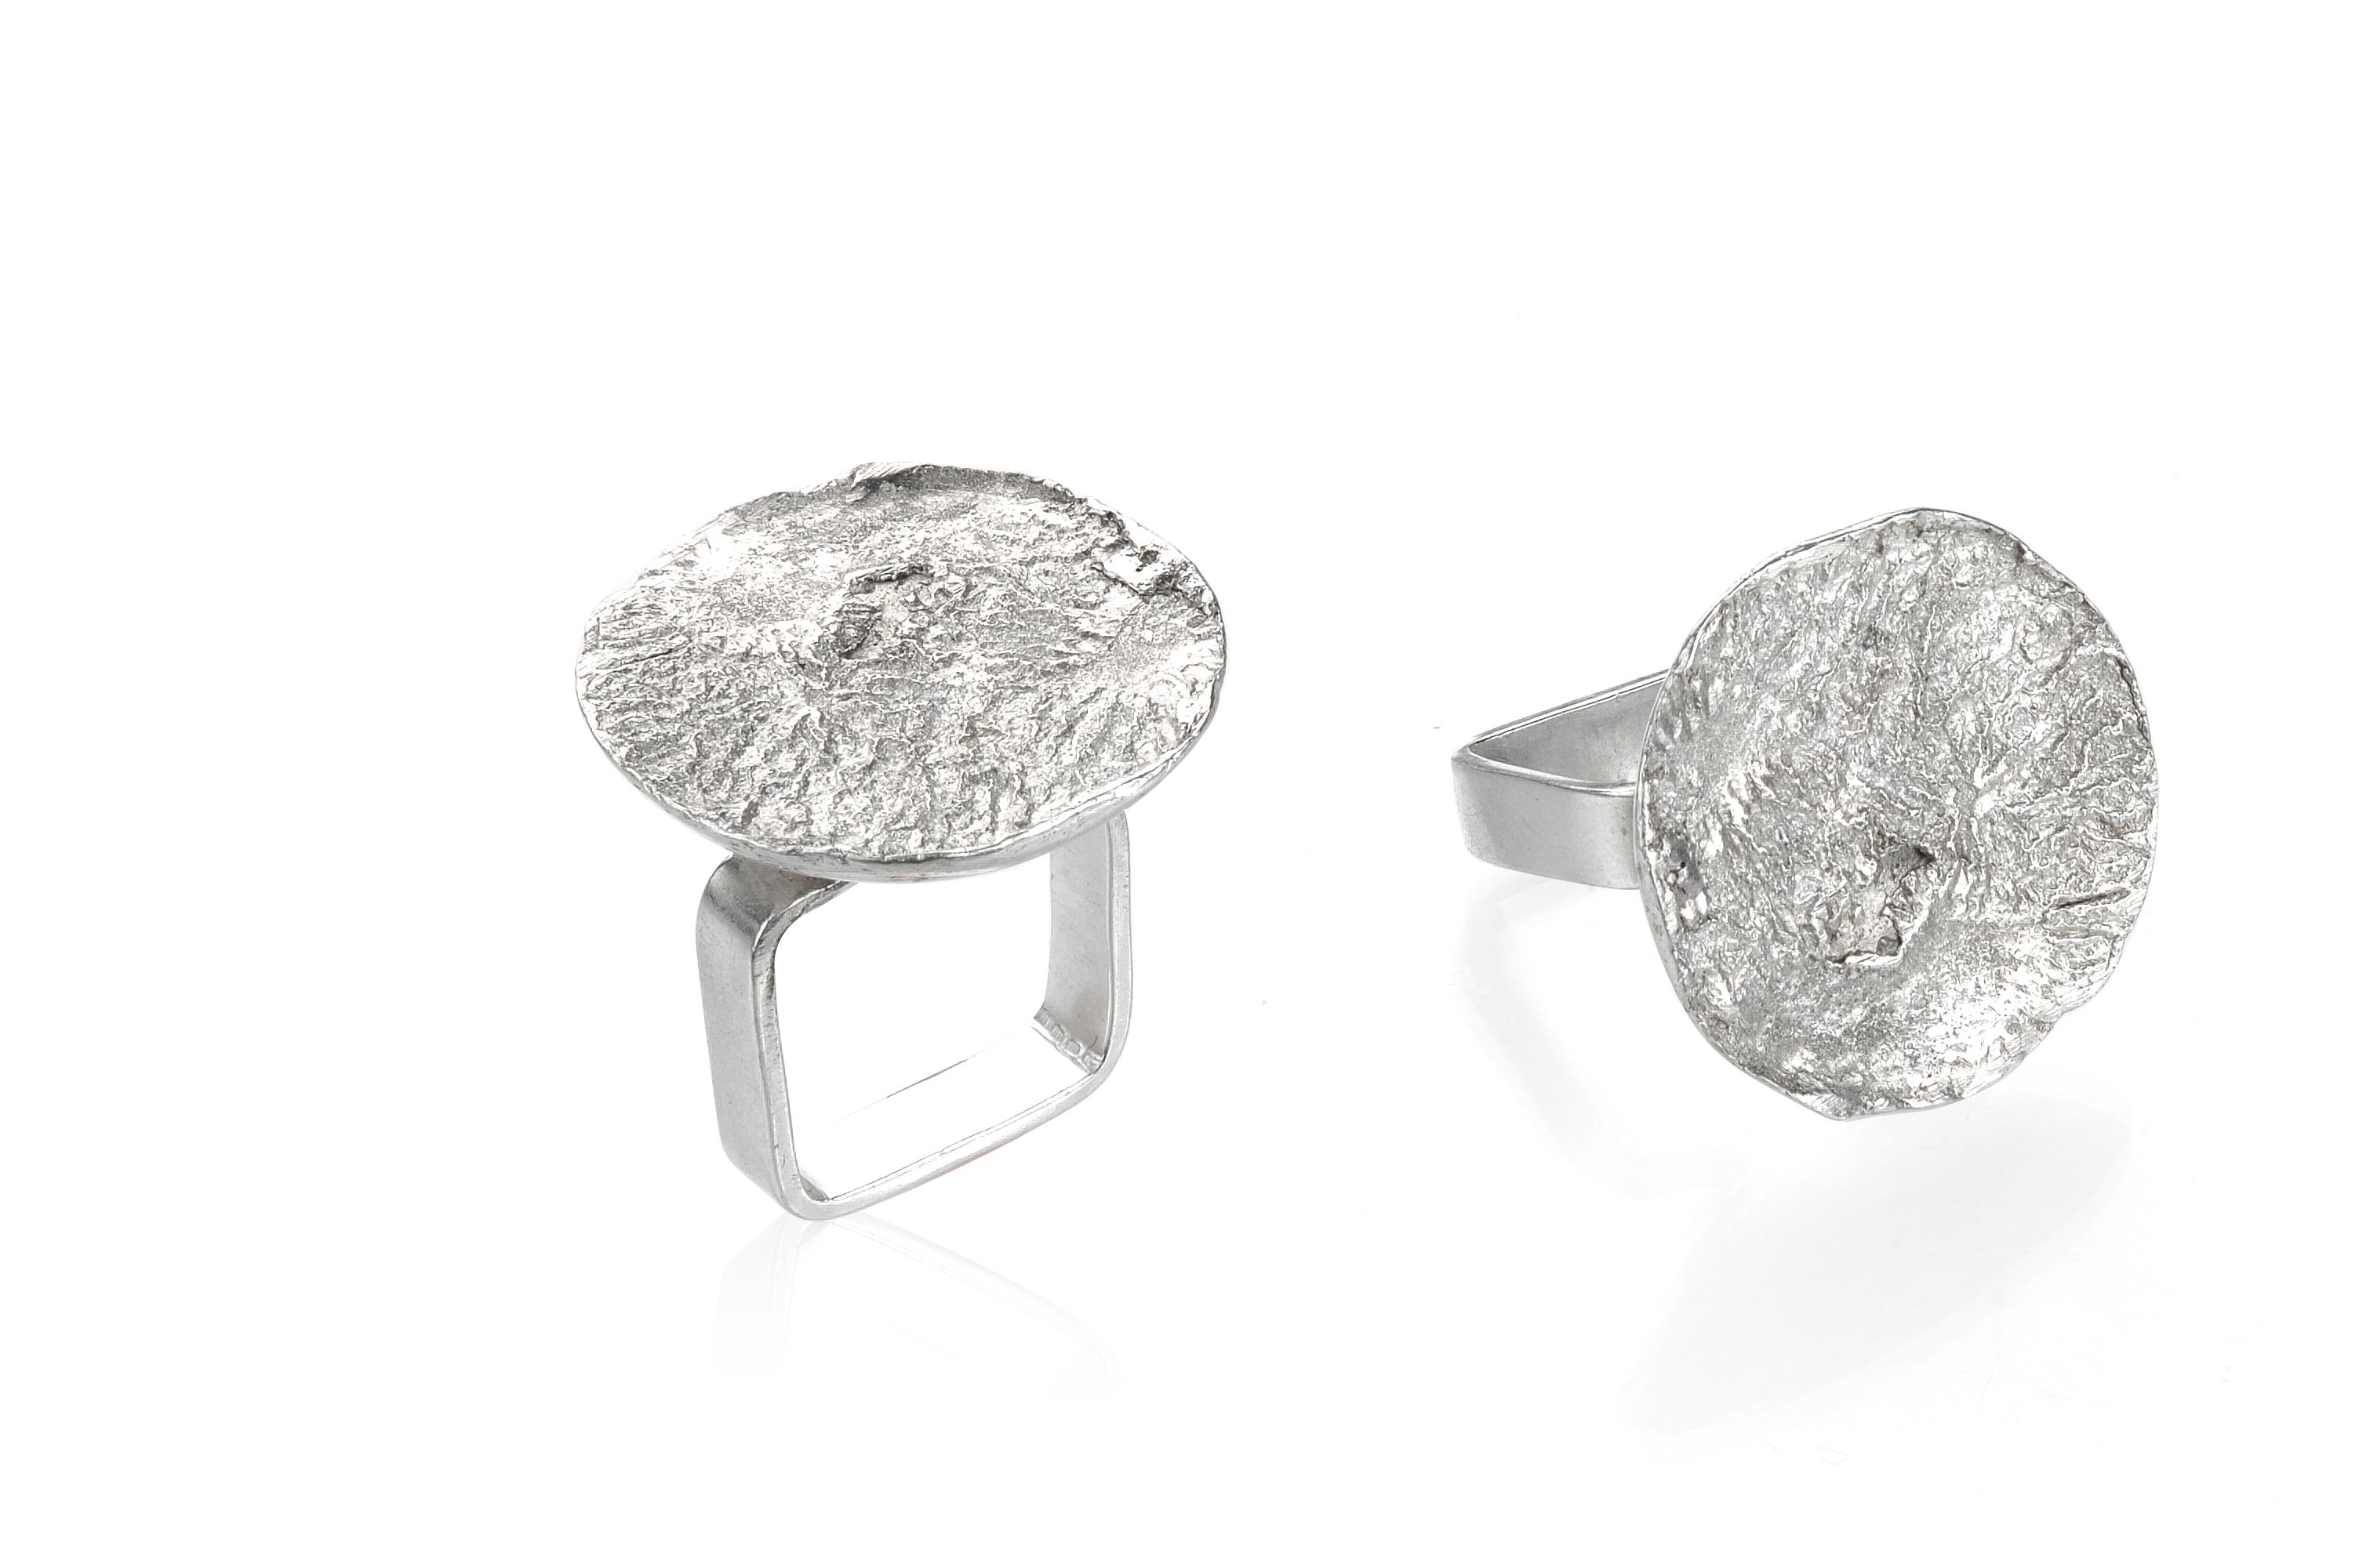 Mindy Recht - Moonscape Ring